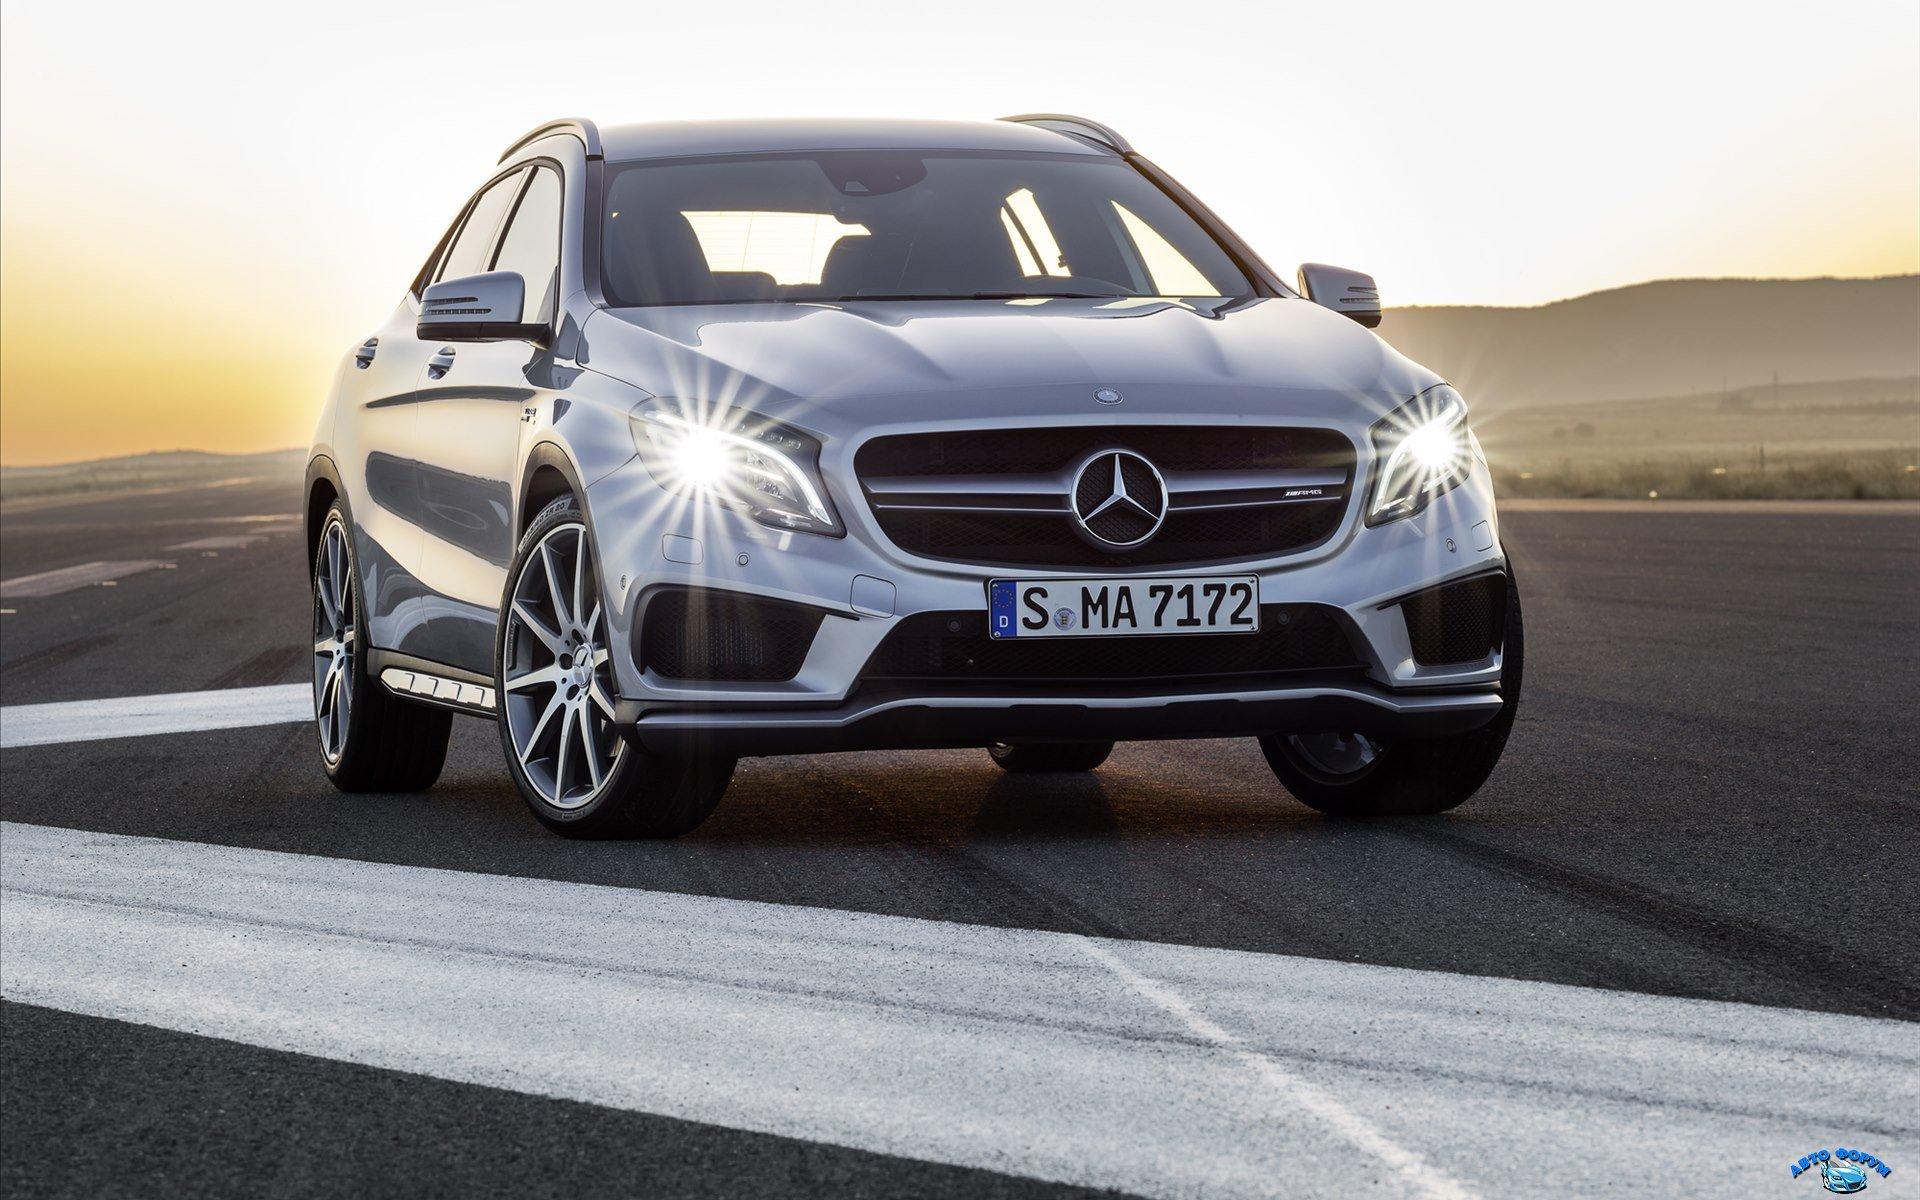 Mercedes-Benz-GLA-45-AMG-2014-widescreen-04.jpg